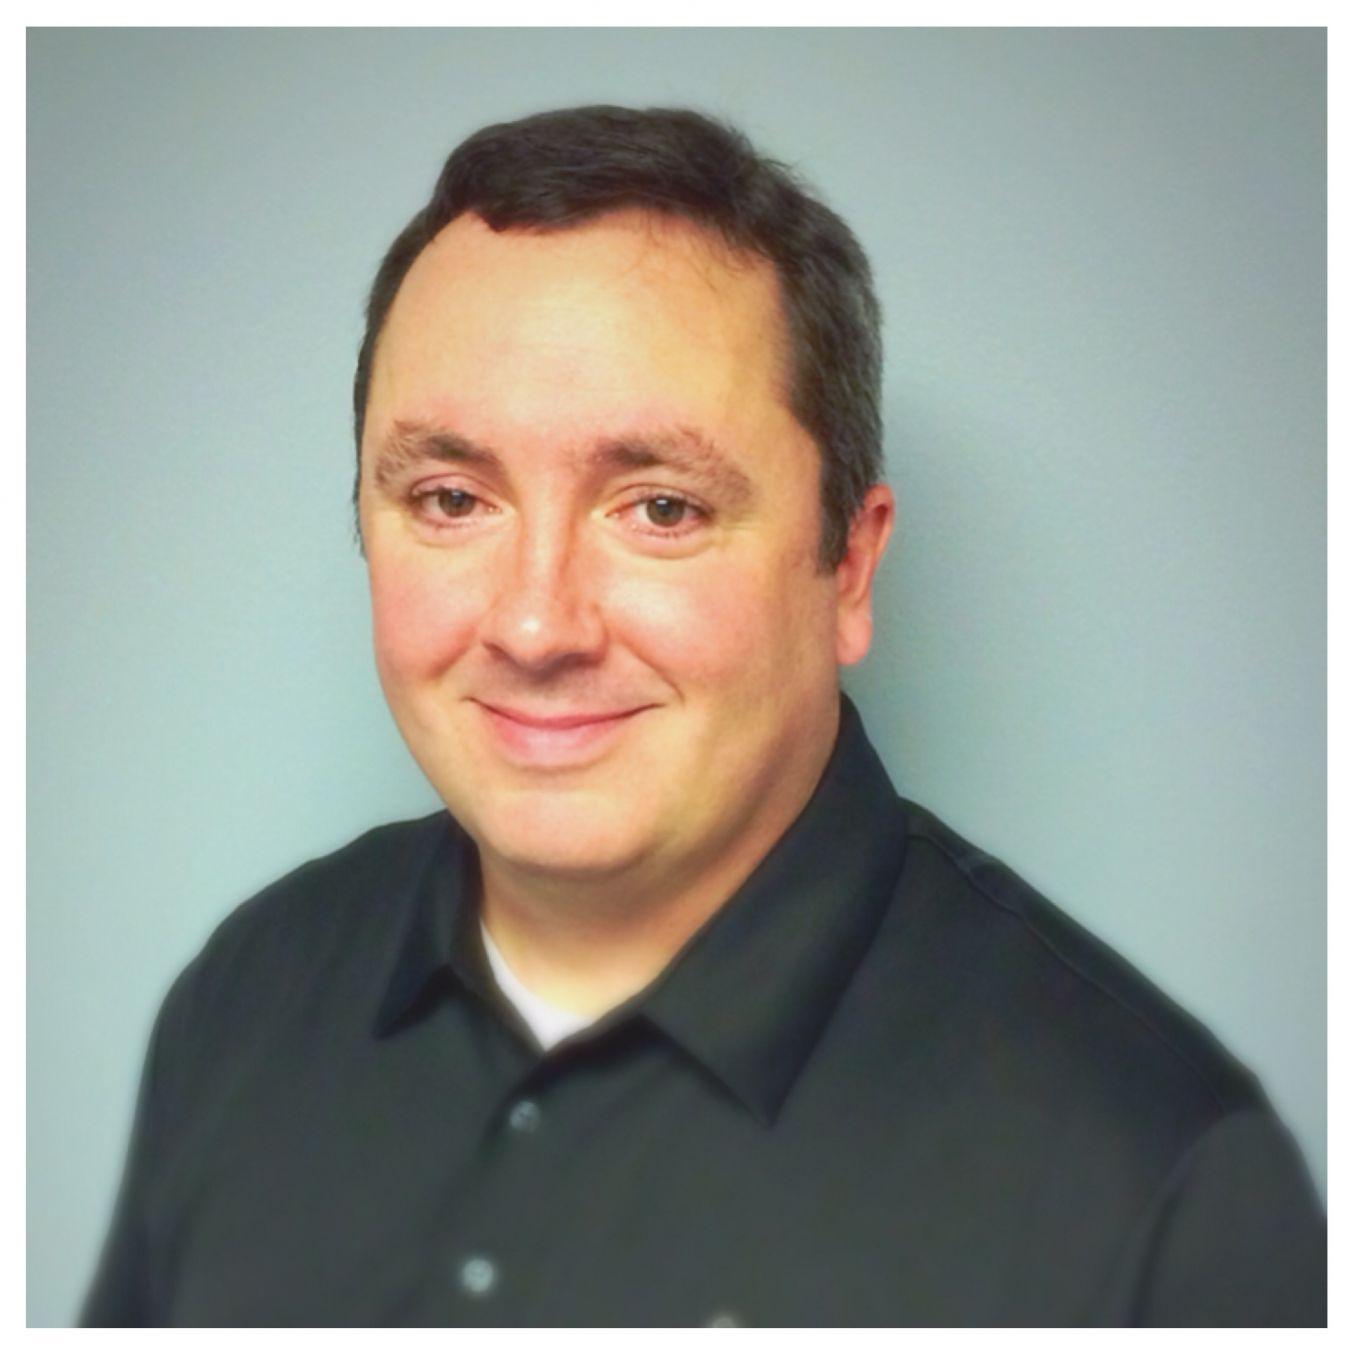 Sean M. Flaherty, PT, OCS